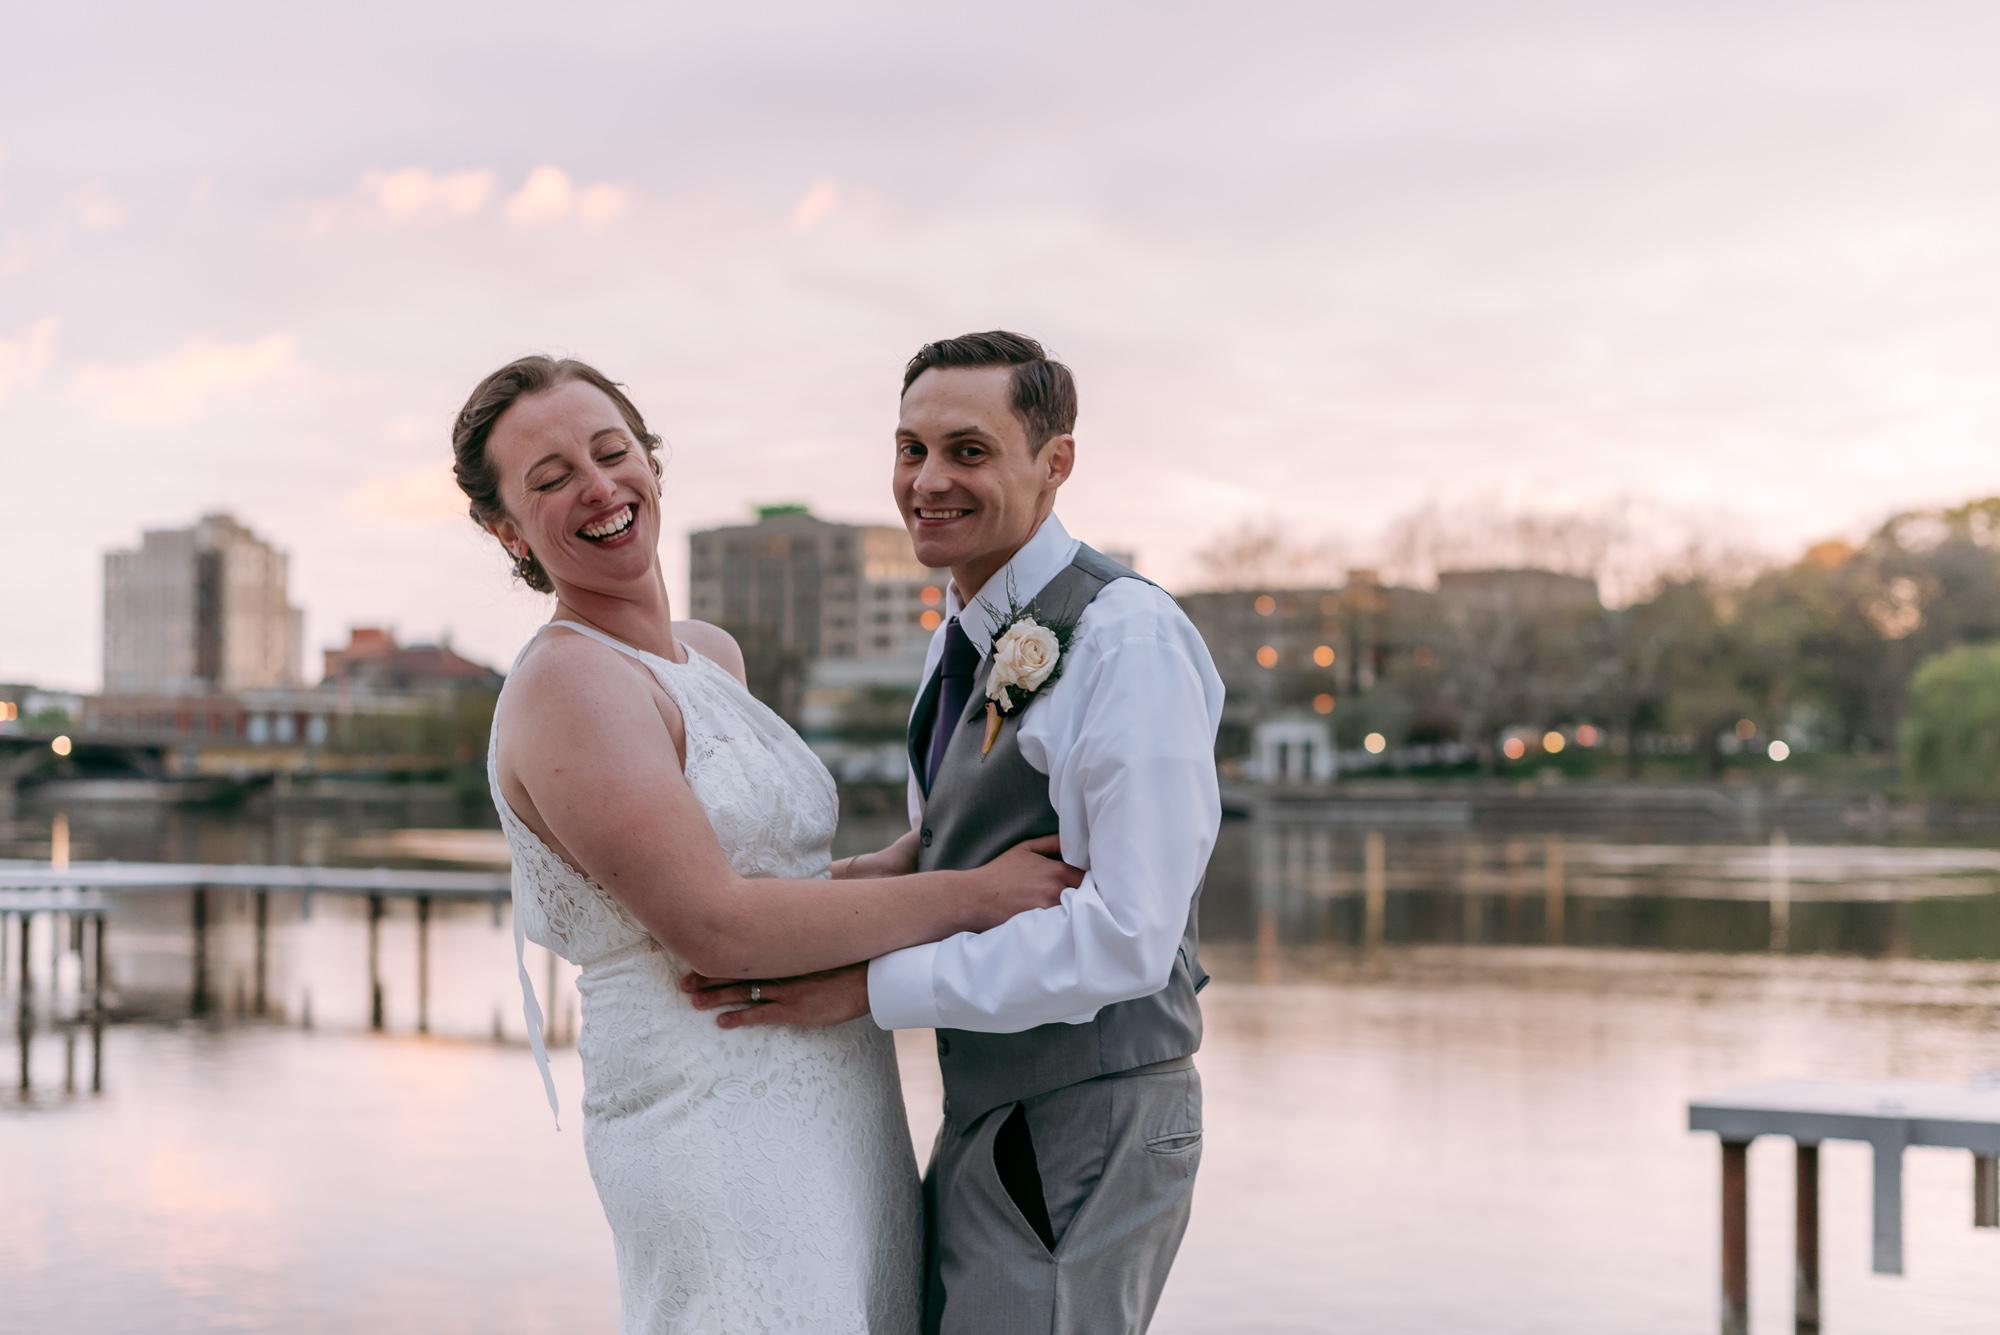 prairie-street-brewhouse-wedding-Rockford-IL-wedding-photographers-263.jpg